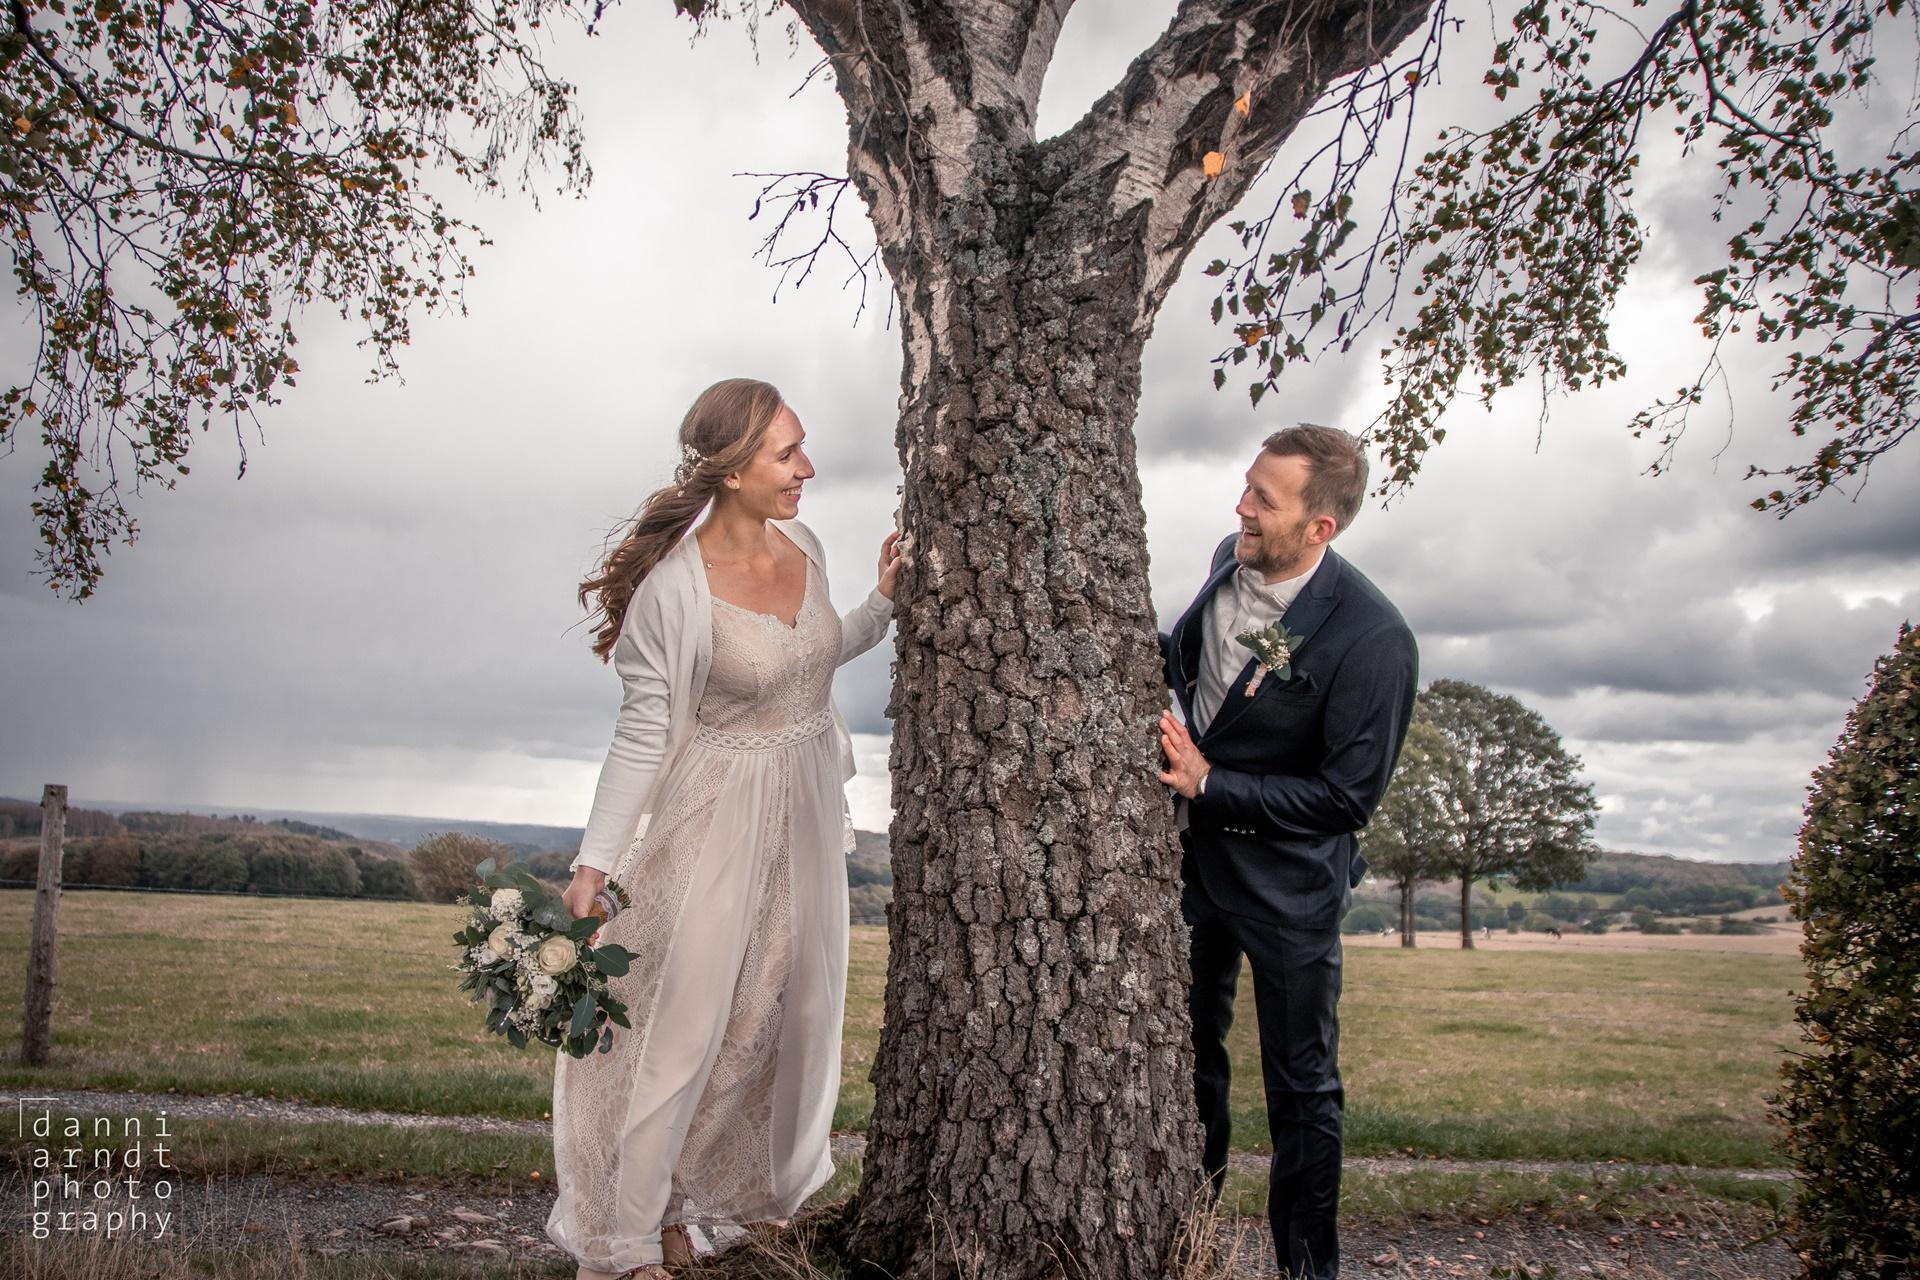 Hochzeitsfotos V&D Wedding